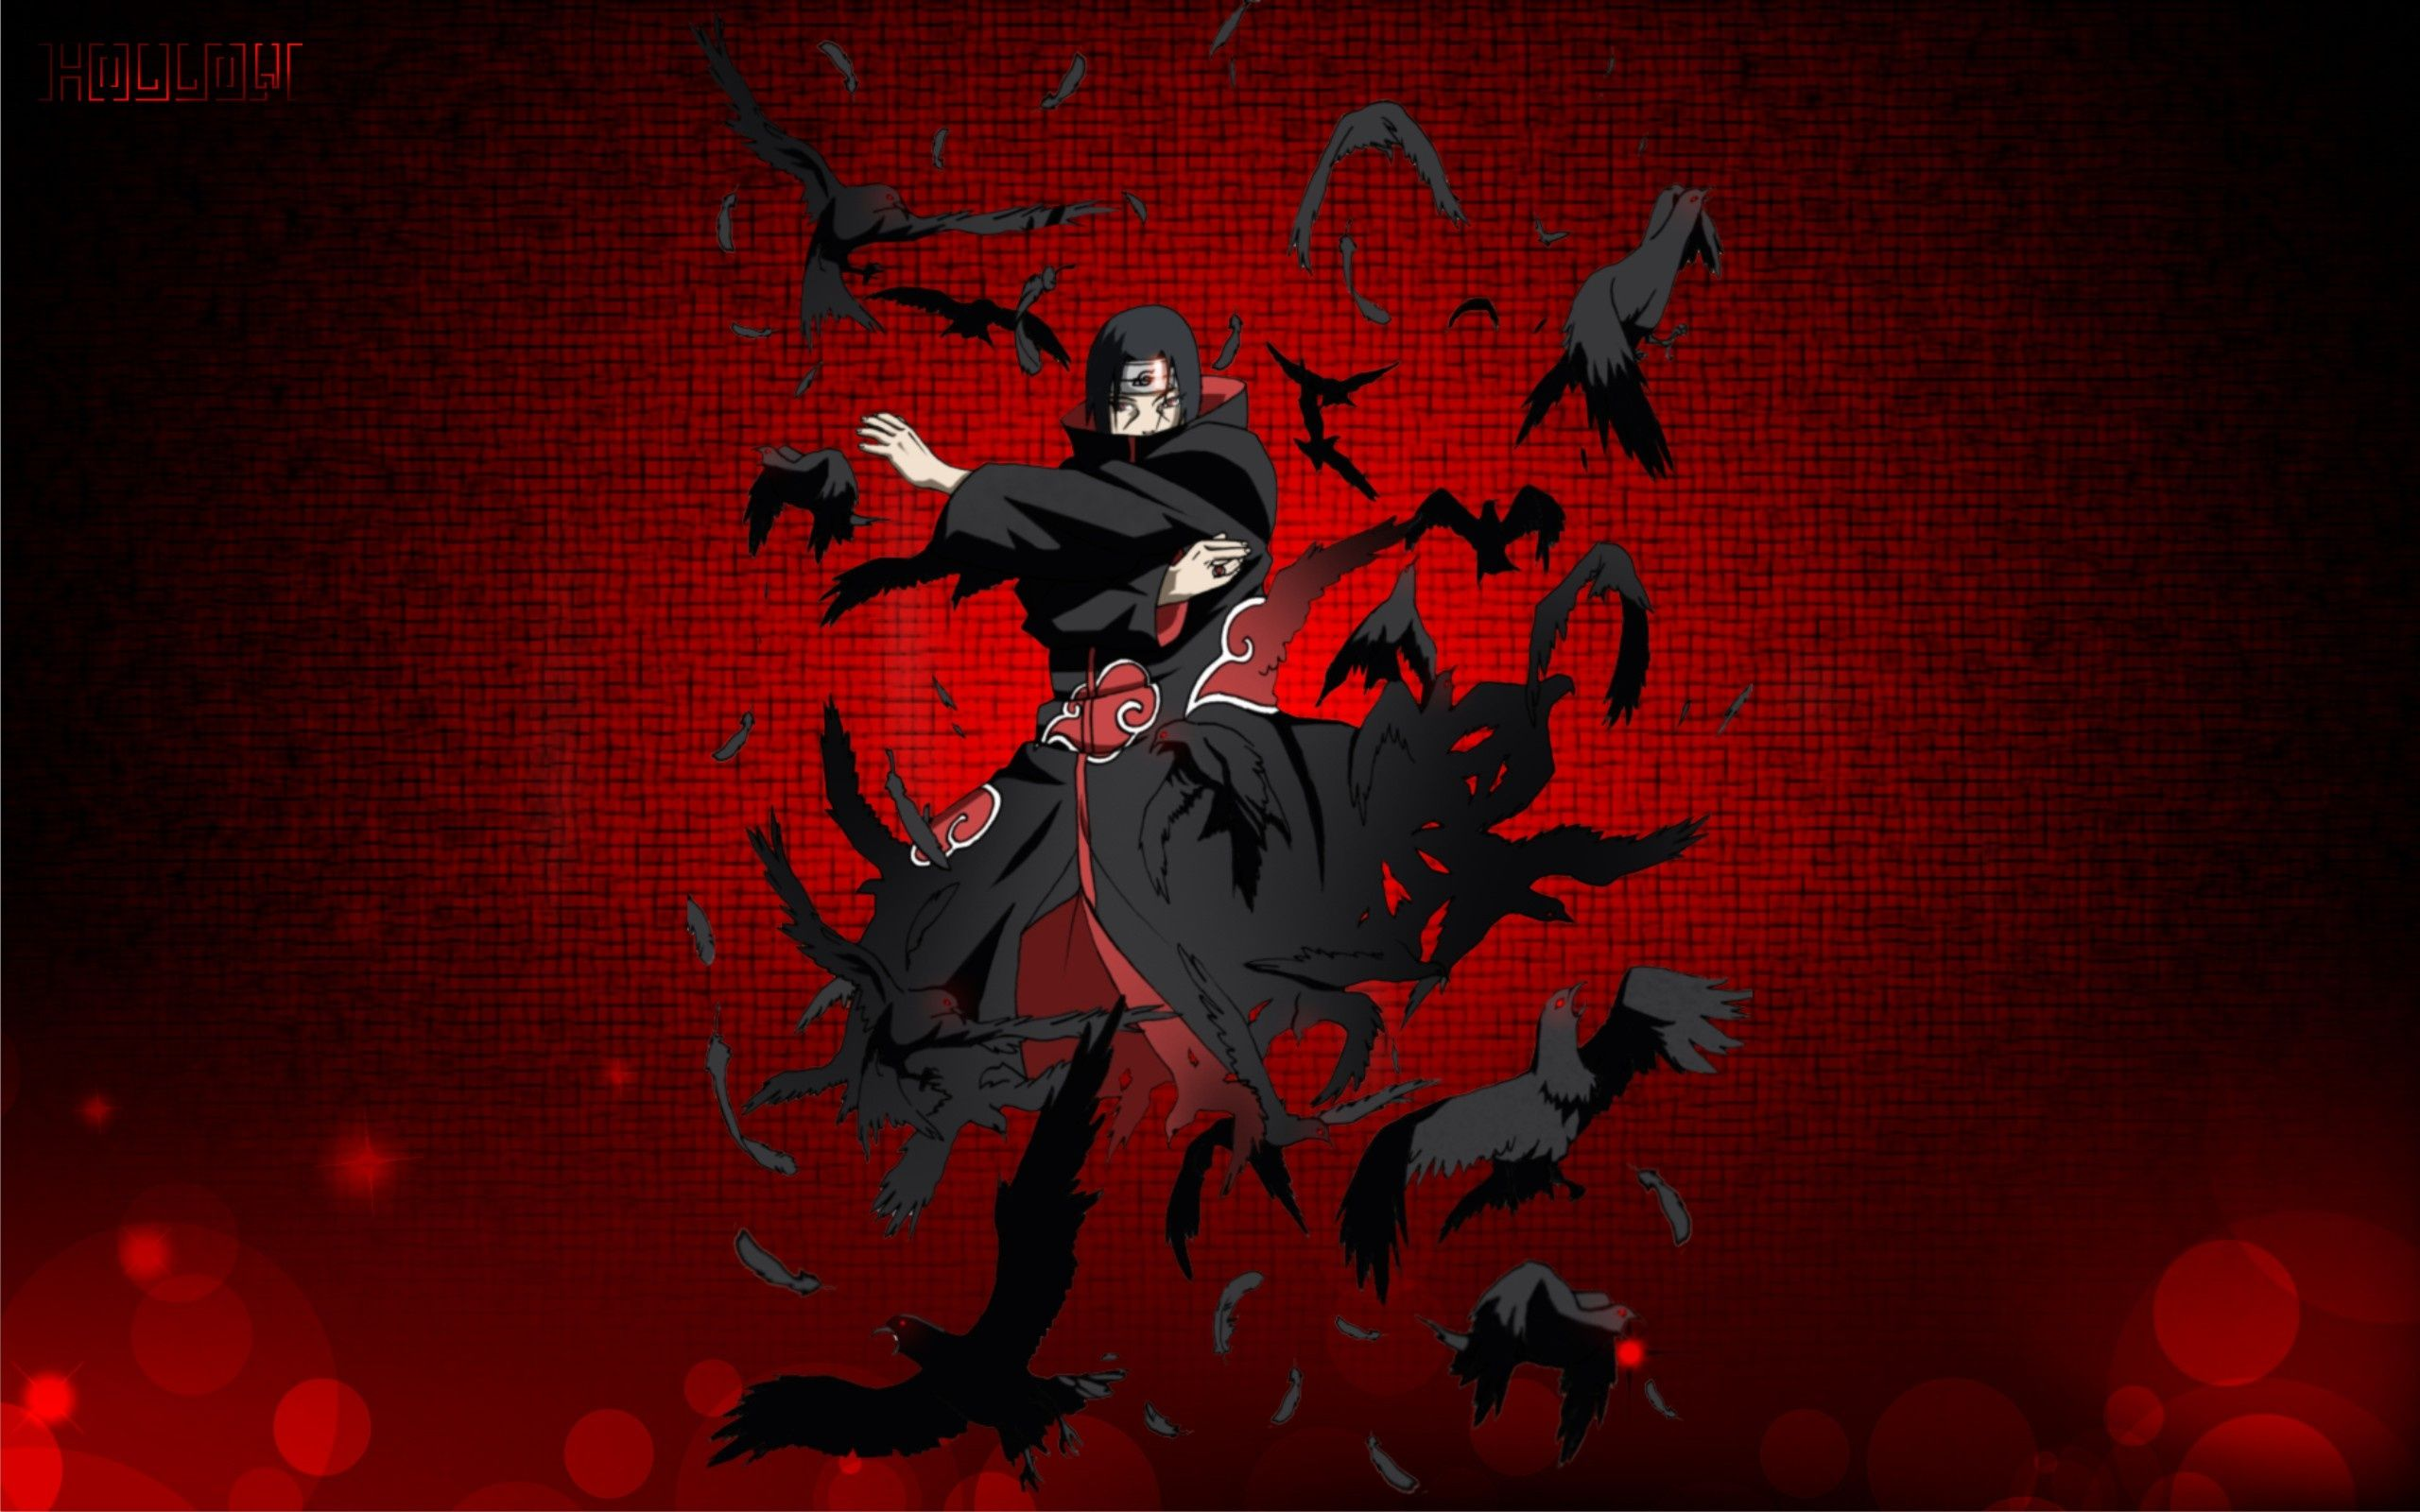 Wallpapers Anime Full Hd Naruto